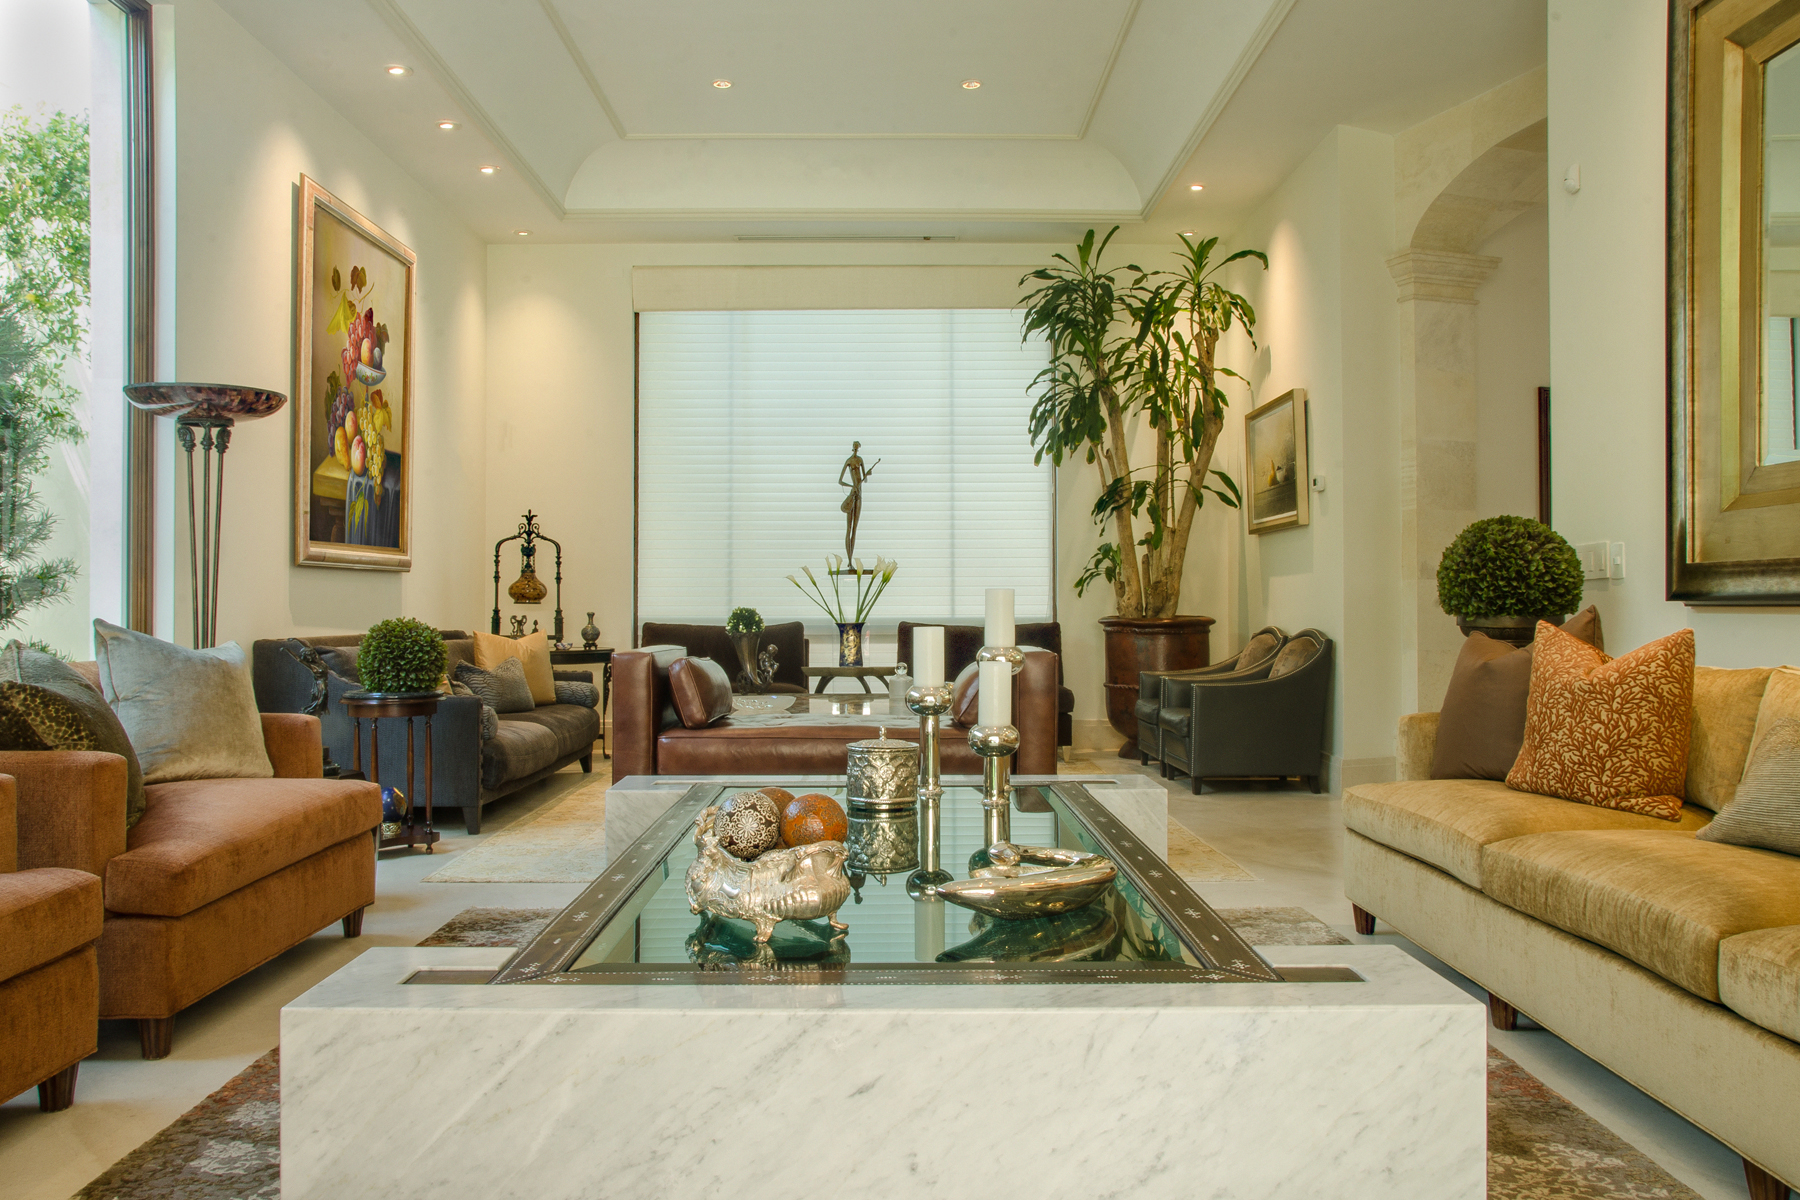 Additional photo for property listing at Villa Saint Joseph Monterrey,  Monterrey, Nuevo Leon 66278 Mexico